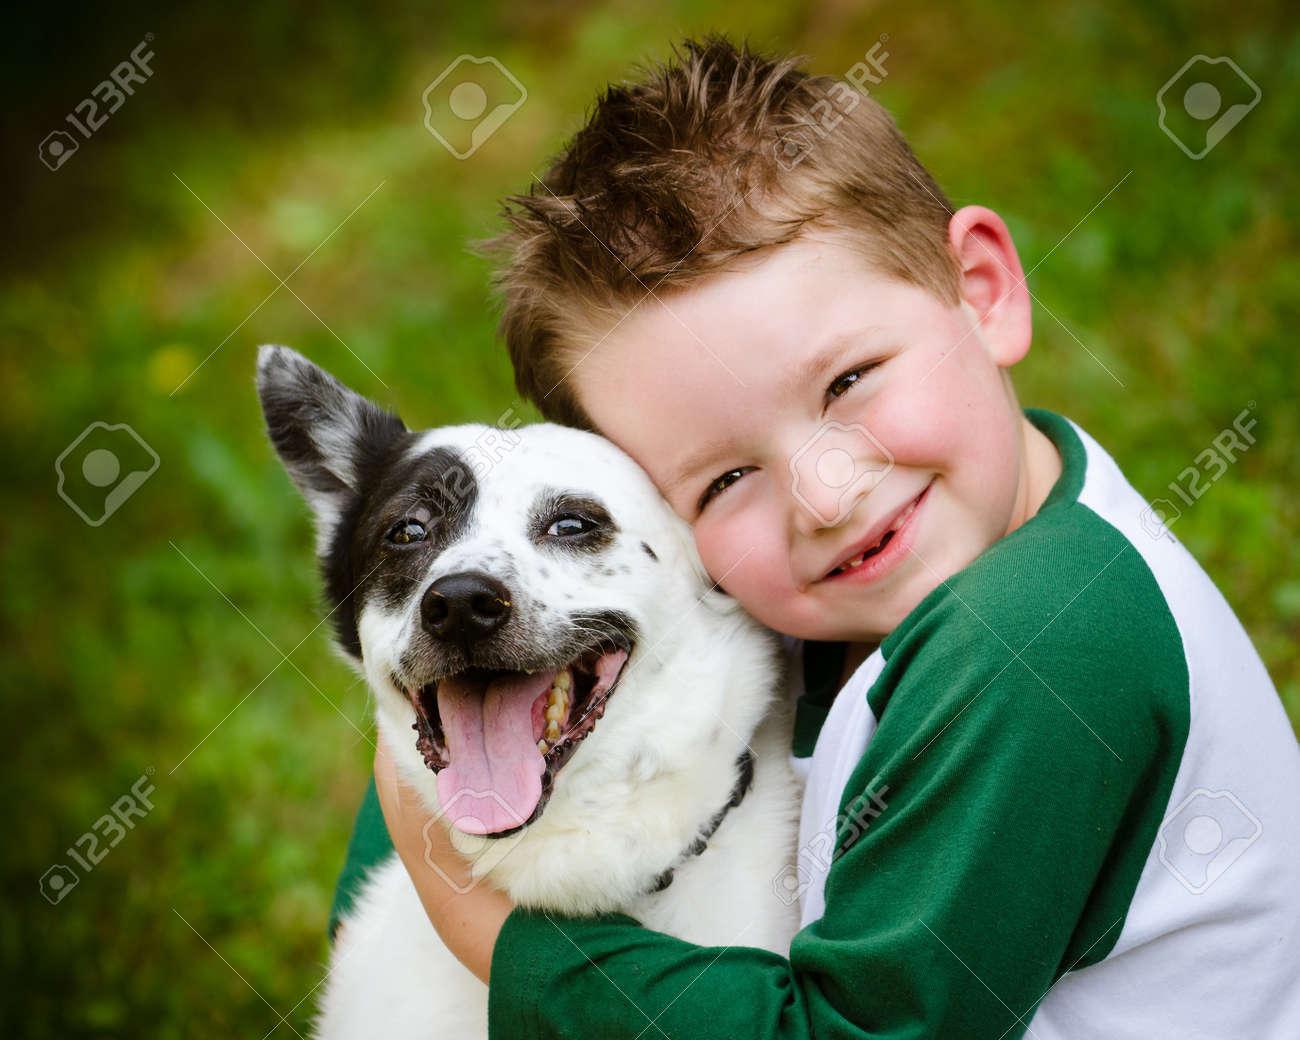 Child lovingly embraces his pet dog, a blue heeler - 19638411